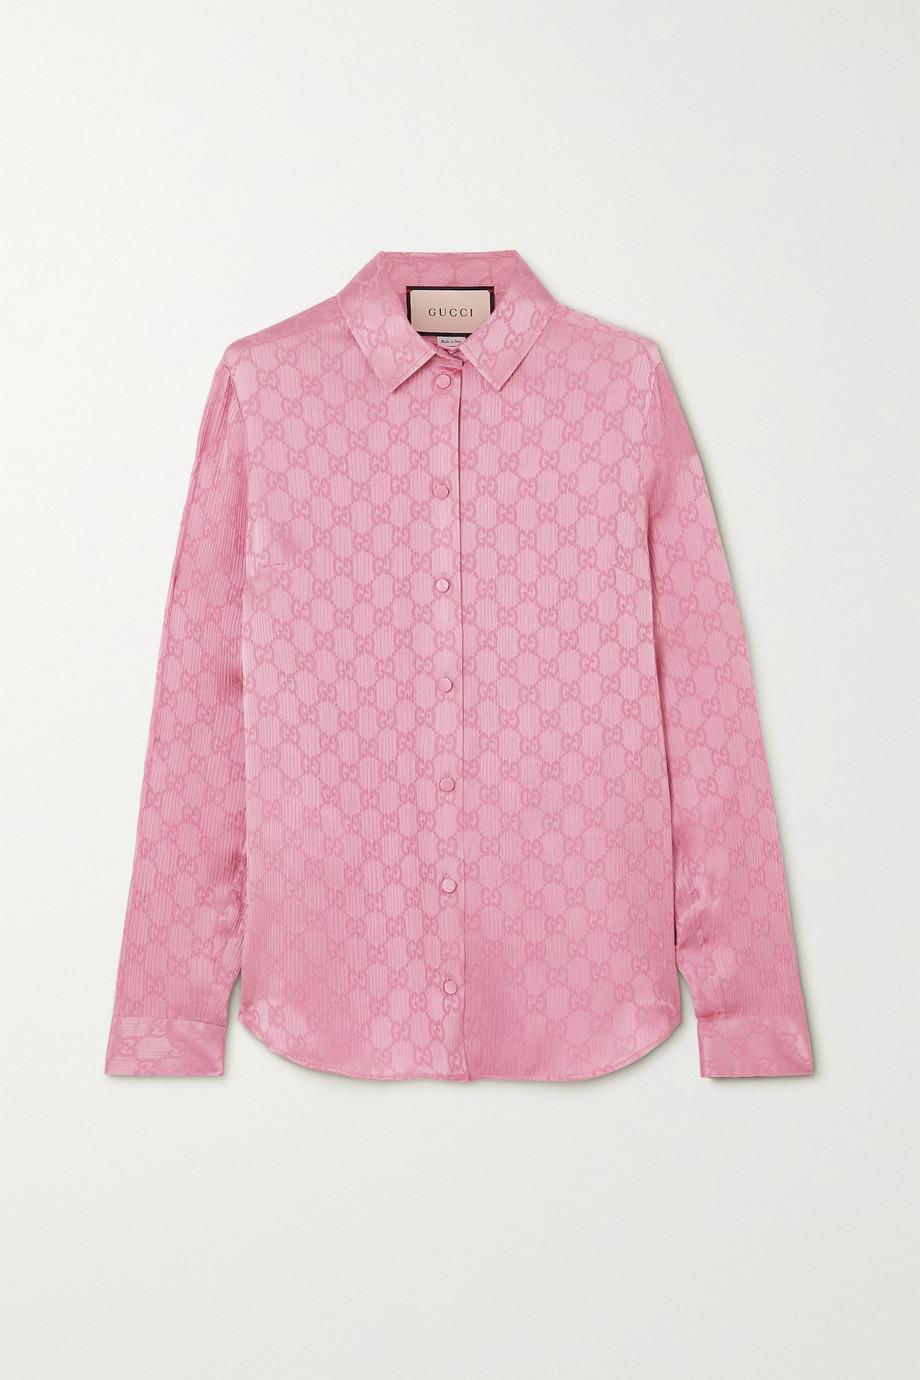 Gucci Hemd aus plissiertem Seiden-Jacquard